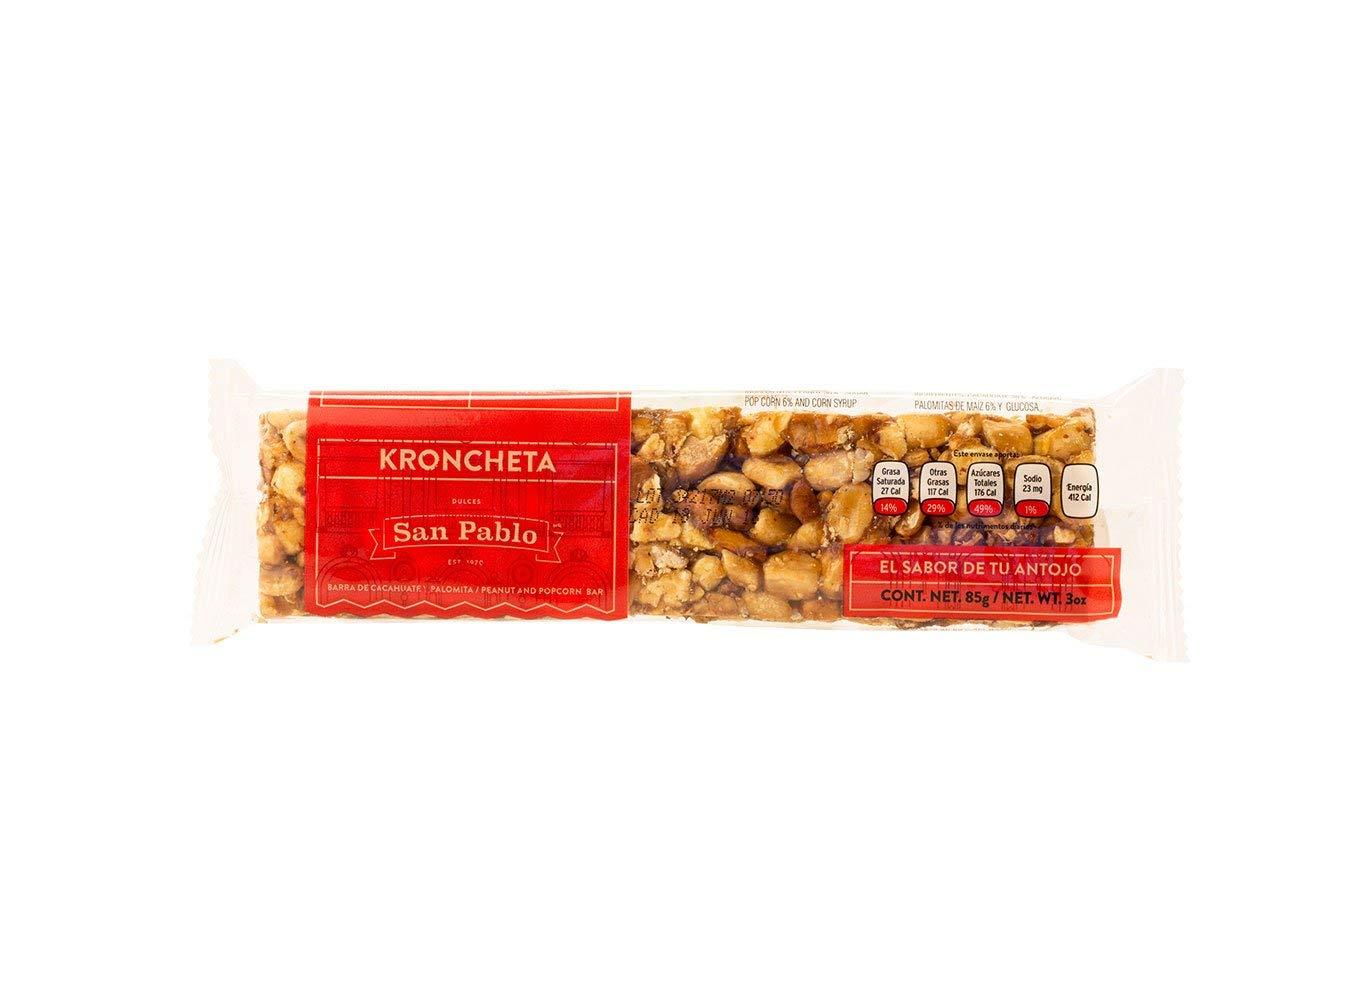 San Pablo Kroncheta - Peanut and Popcorn Bar - Palanqueta 3 Pack (6 pieces of 3 Oz. per pack): Amazon.com: Grocery & Gourmet Food